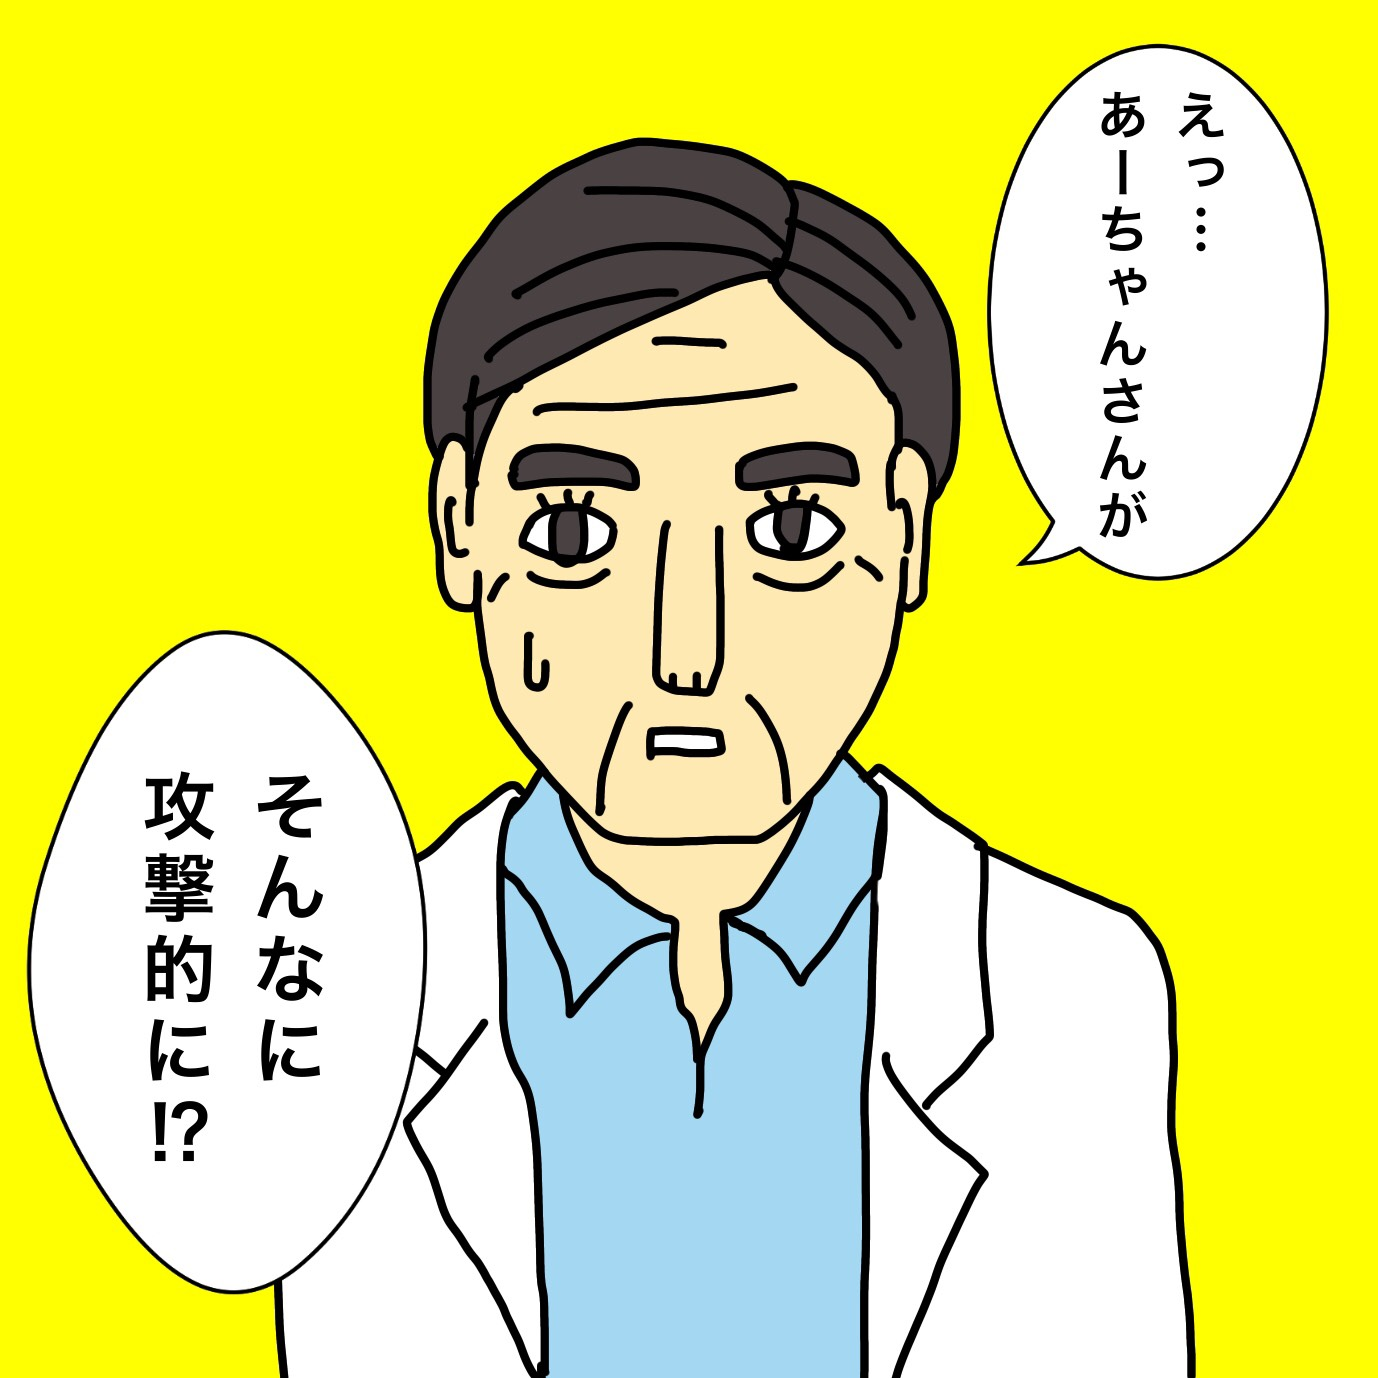 Image-16.jpeg